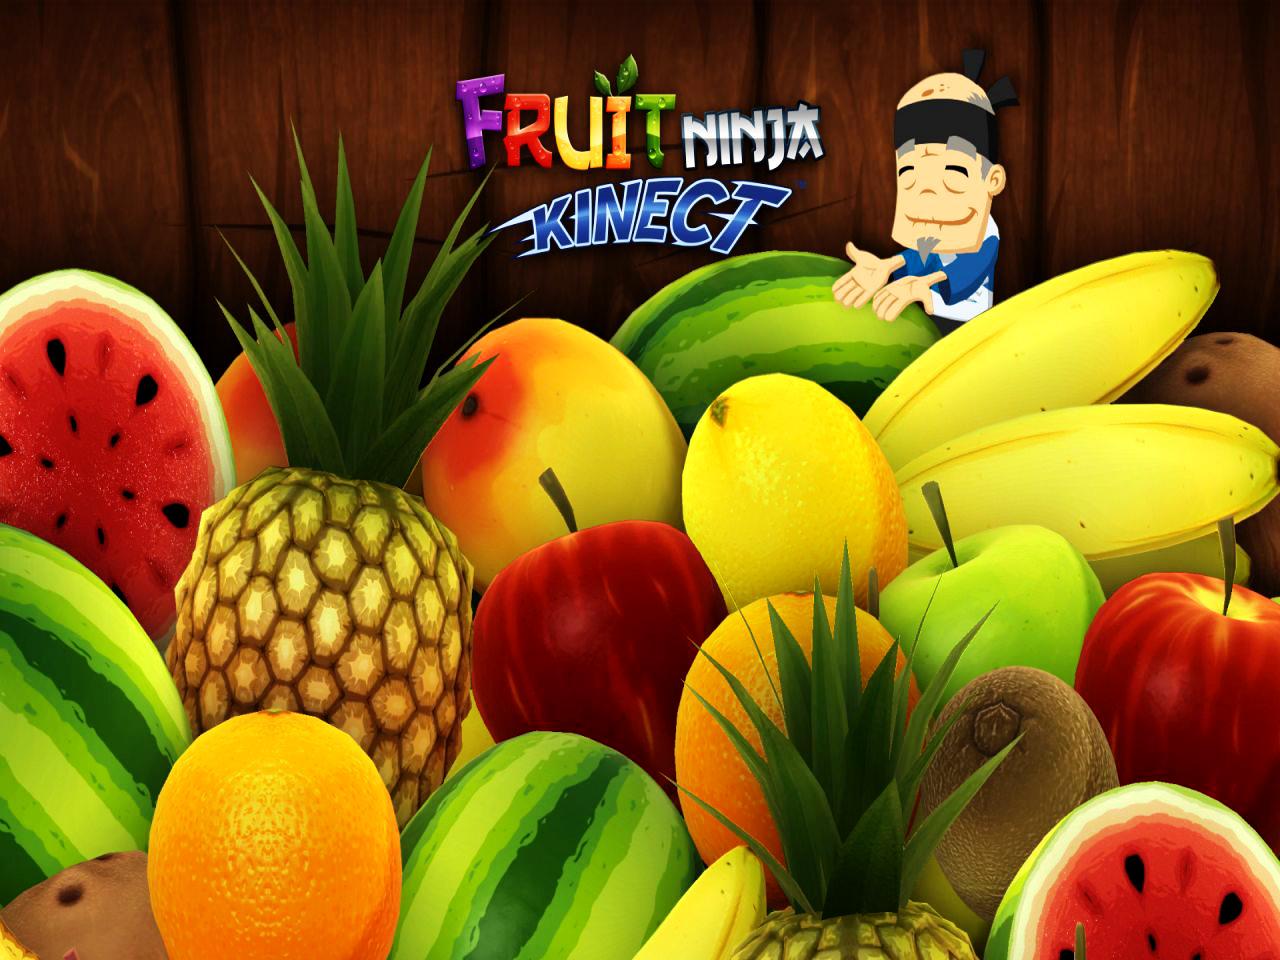 Fruit Ninja Cute Old Ninja and Fruits Illustration HD Wallpaper 1280x960